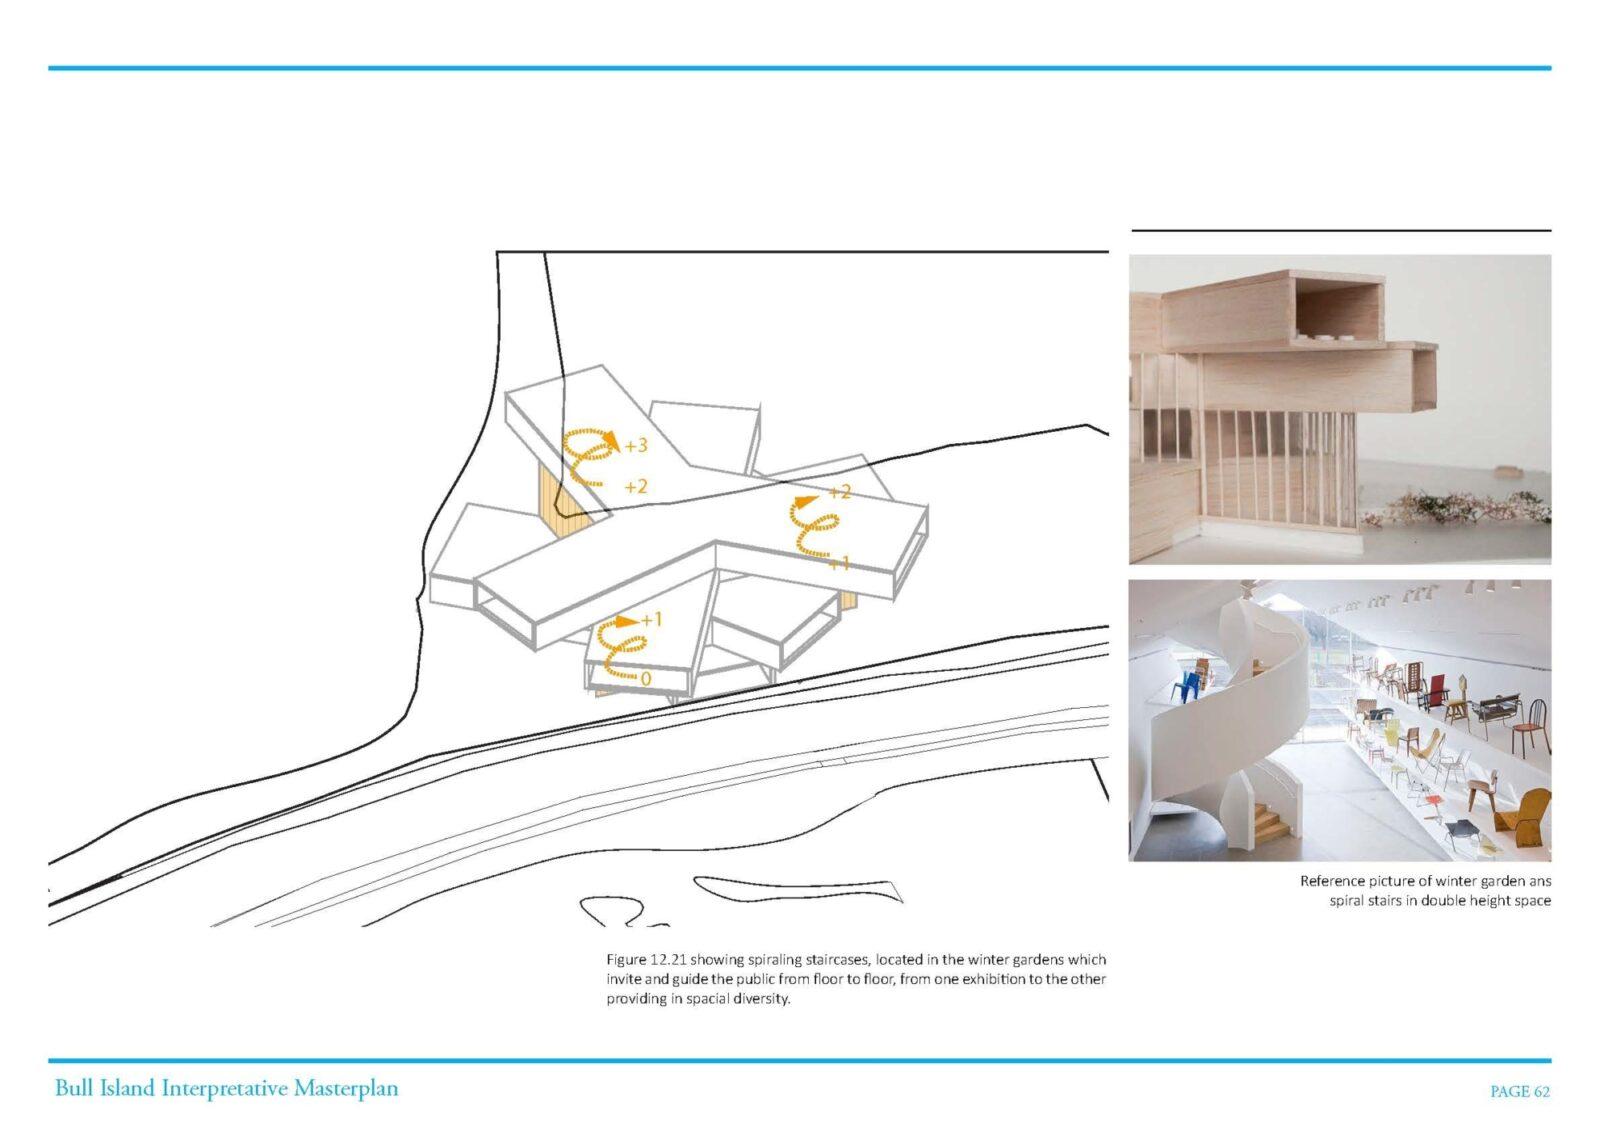 1326 Bull Island Final Report Website 5 Reduced 140815 28